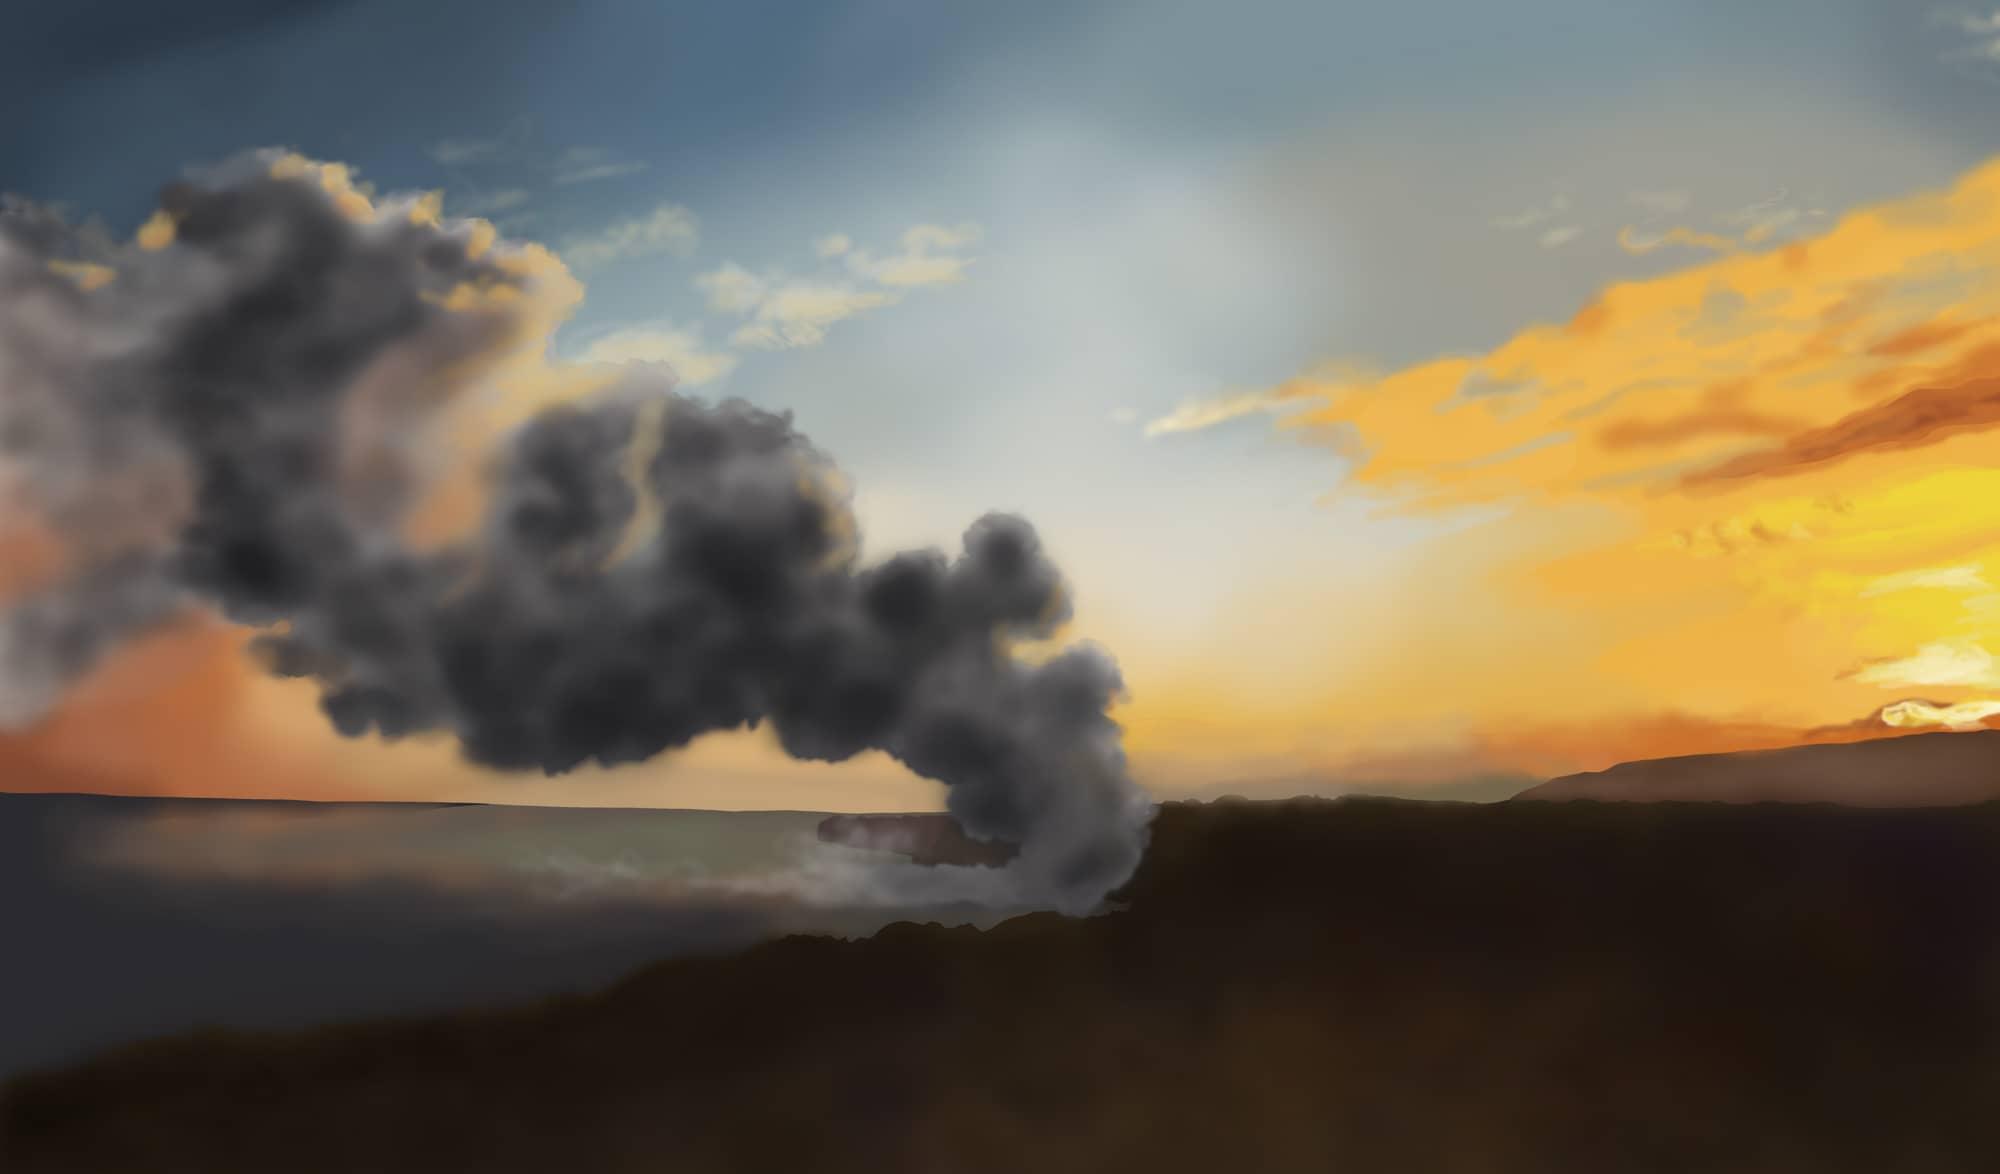 Digital painting of lava reaching the sea - Kūkulu Ka Pahu - by Kaoru Coakley